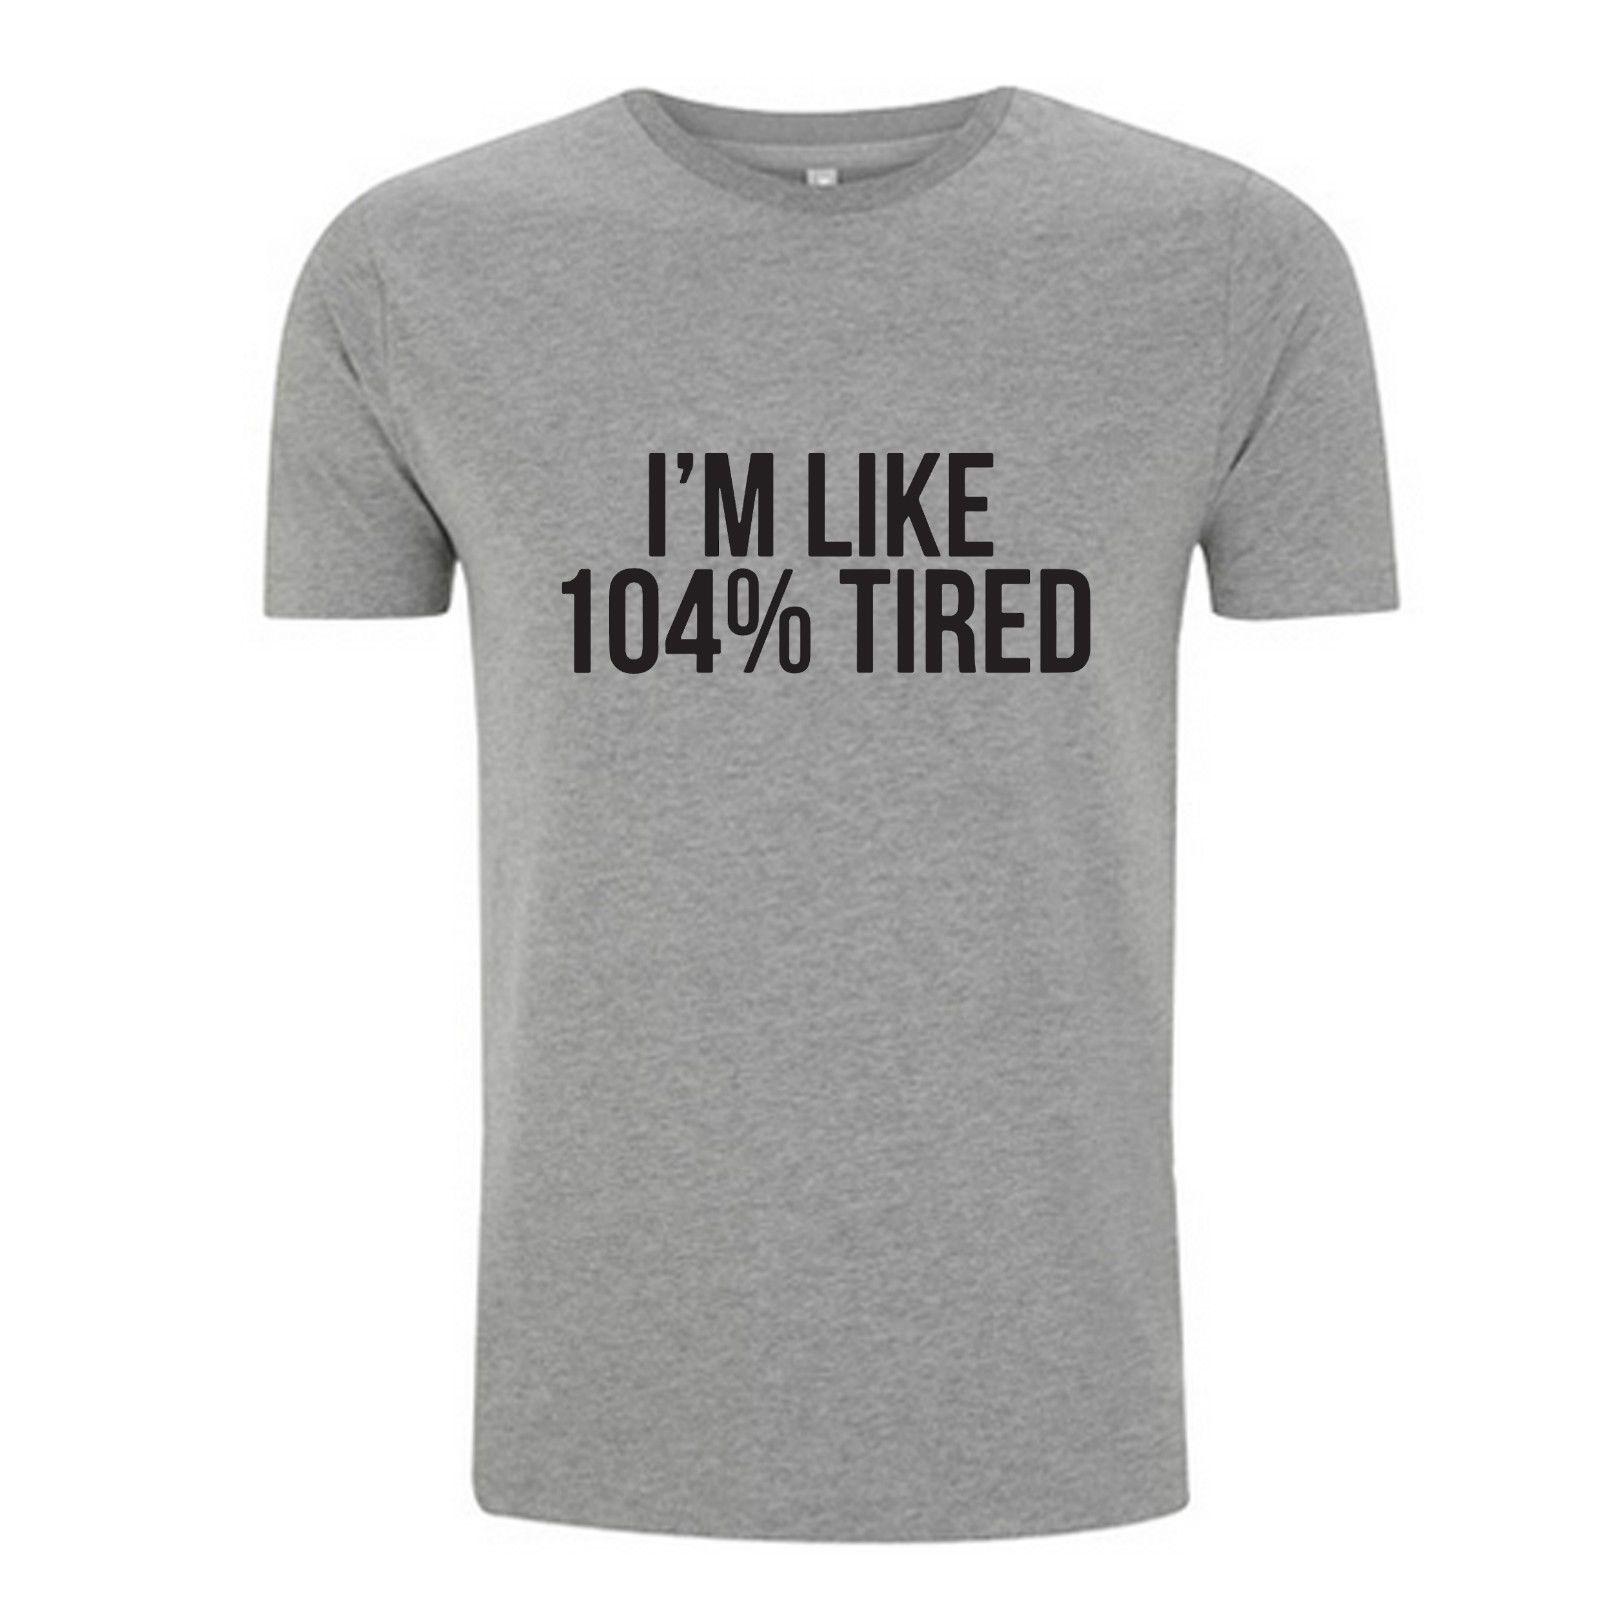 4862fcd8 IM LIKE 104% TIRED T SHIRT FUNNY SLOGAN T SHIRT TOP 100% COTTON FASHION FIT  Cool Casual Pride T Shirt Men Mens Dress Shirt Patriotic T Shirts From ...